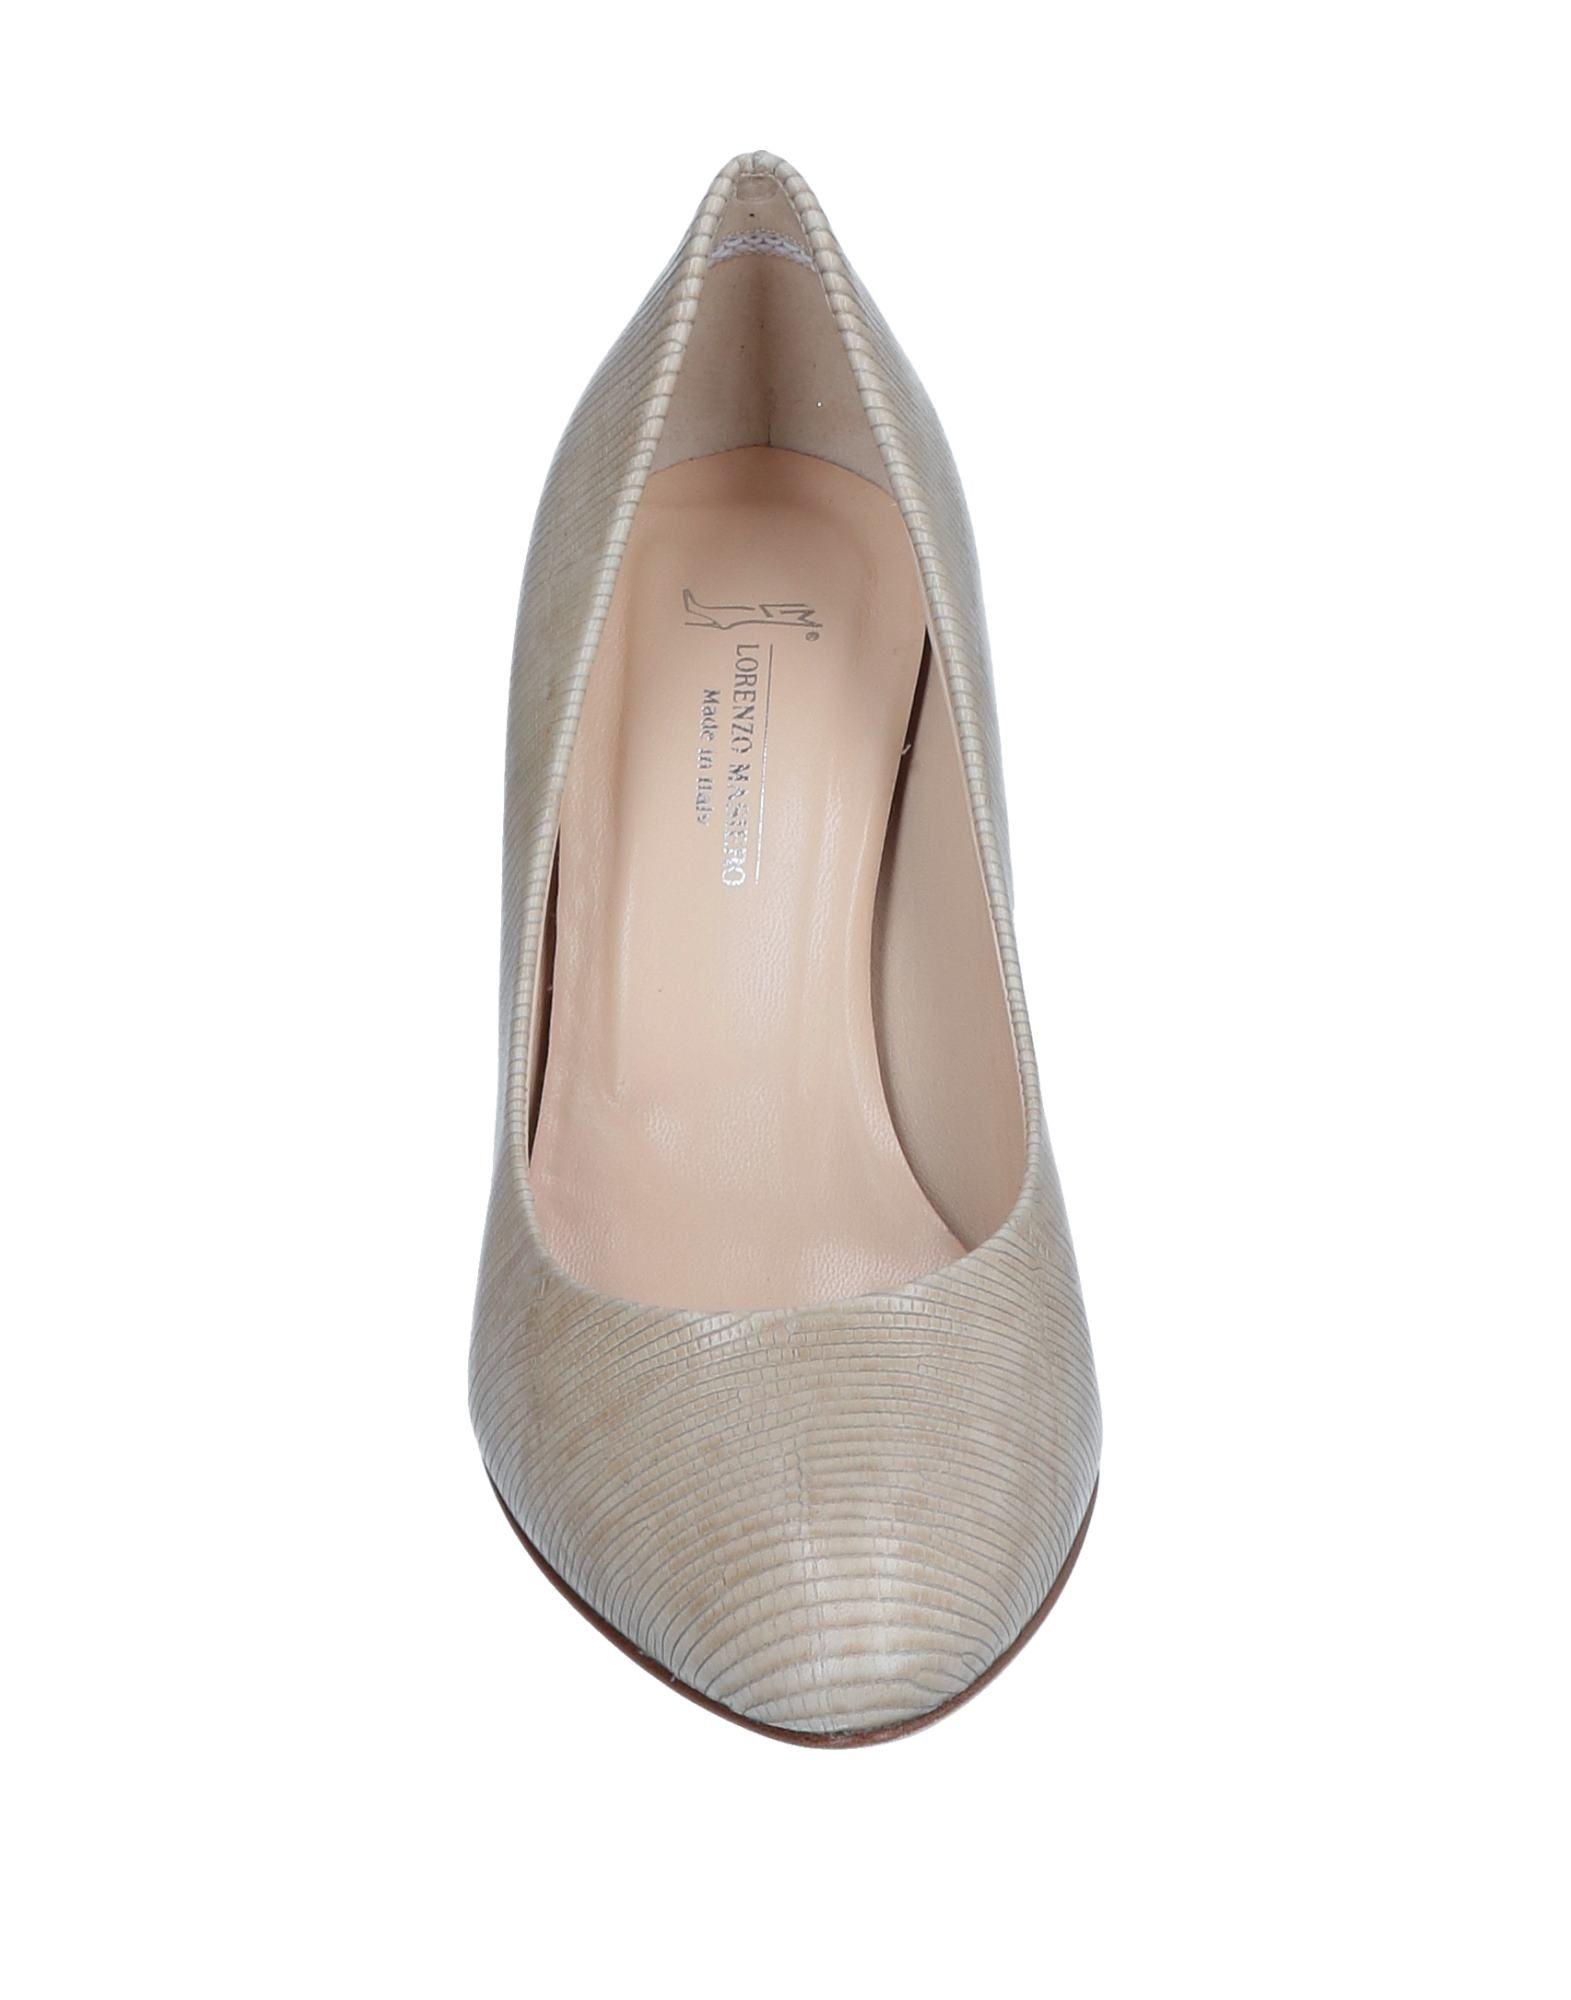 Gut um billige Schuhe zu  tragenLorenzo Masiero Pumps Damen  zu 11547112OD 36da23